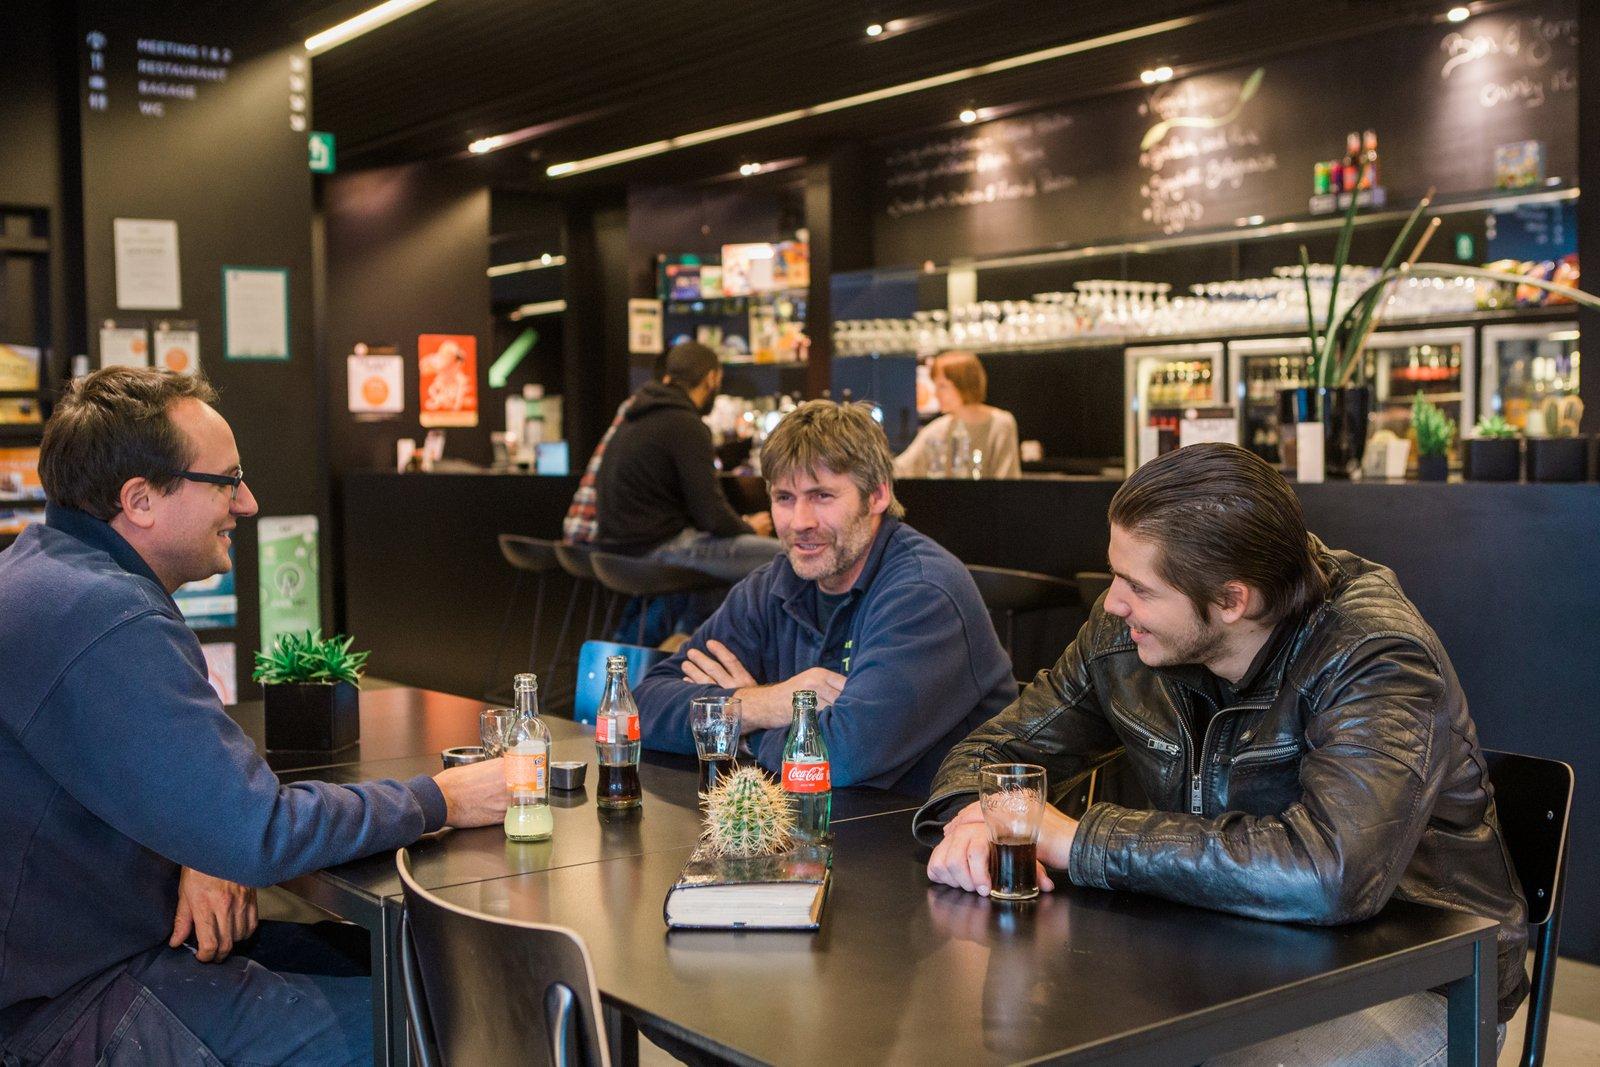 Gasten in de bar van hostel Pulcinella